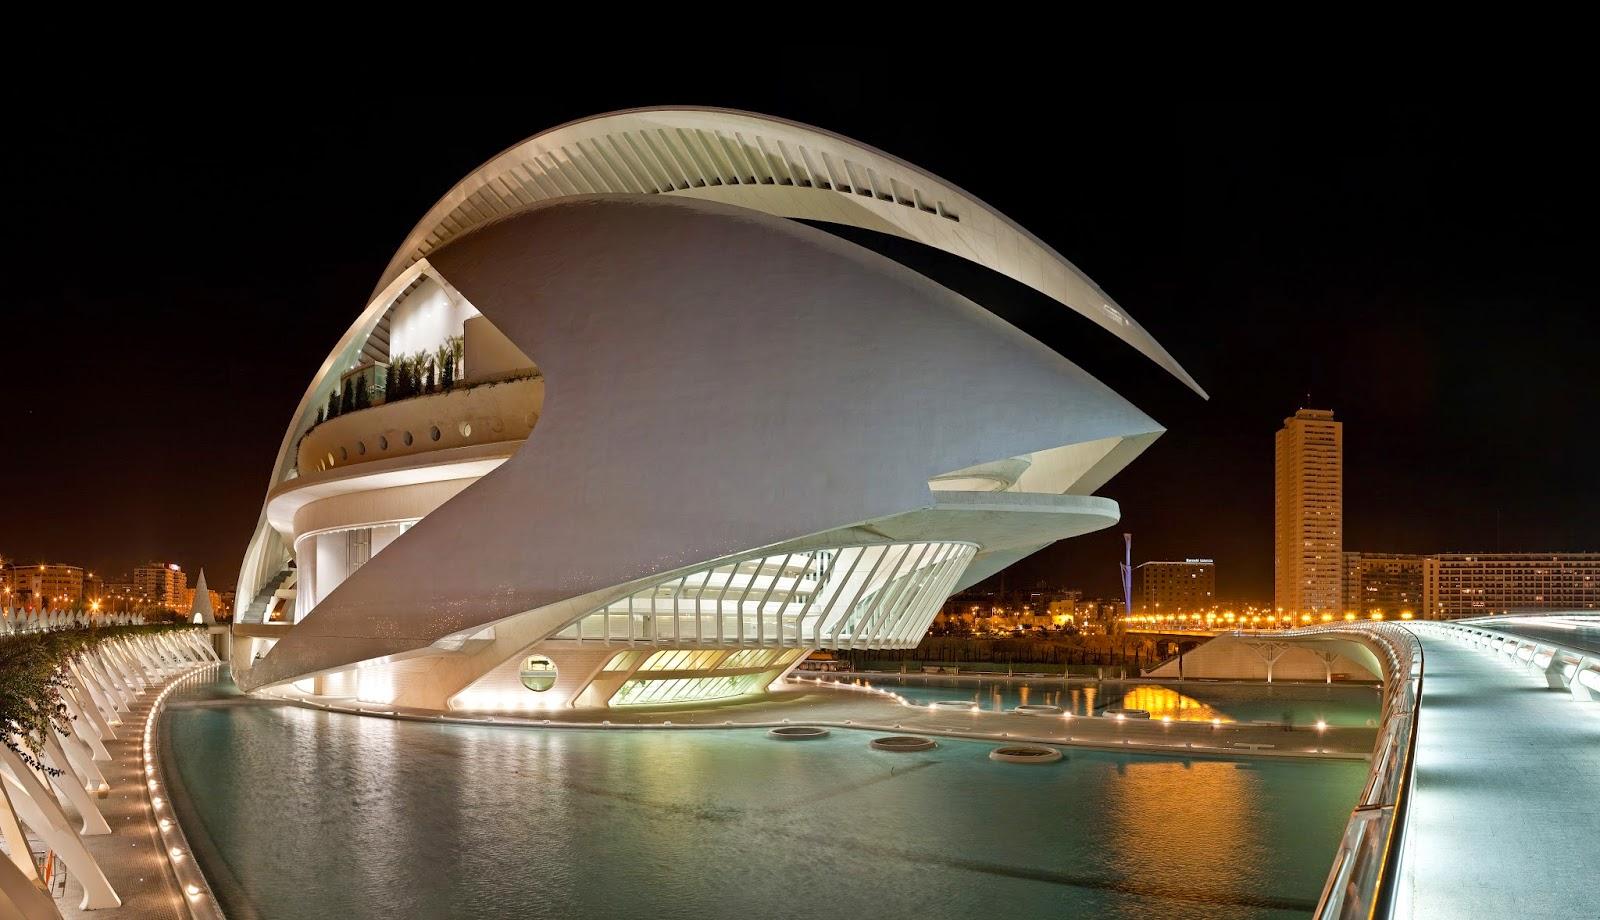 http://commons.wikimedia.org/wiki/File:El_Palau_de_les_Arts_Reina_Sof%C3%ADa,_Valencia_-_Jan_2007.jpg#/media/File:El_Palau_de_les_Arts_Reina_Sof%C3%ADa,_Valencia_-_Jan_2007.jpg